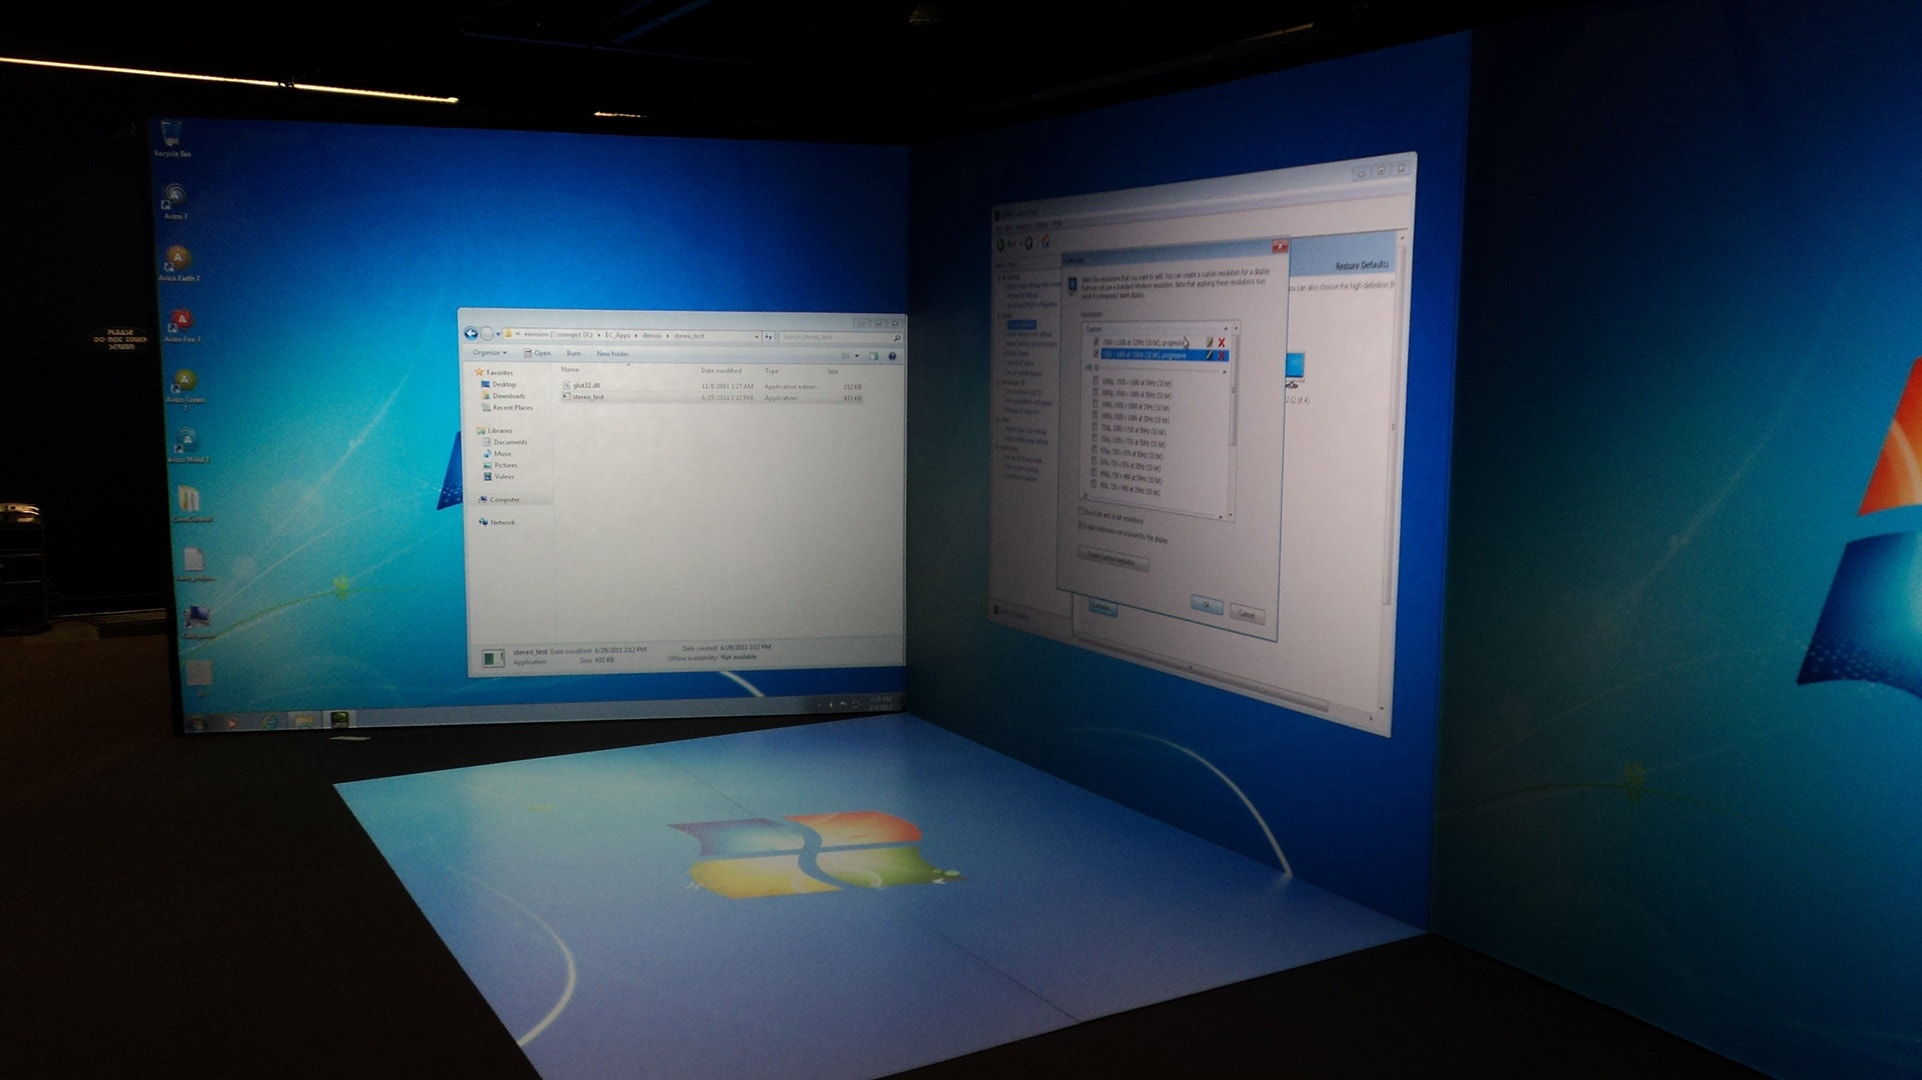 IGI flex cave system microsoft OS large HD screen projection